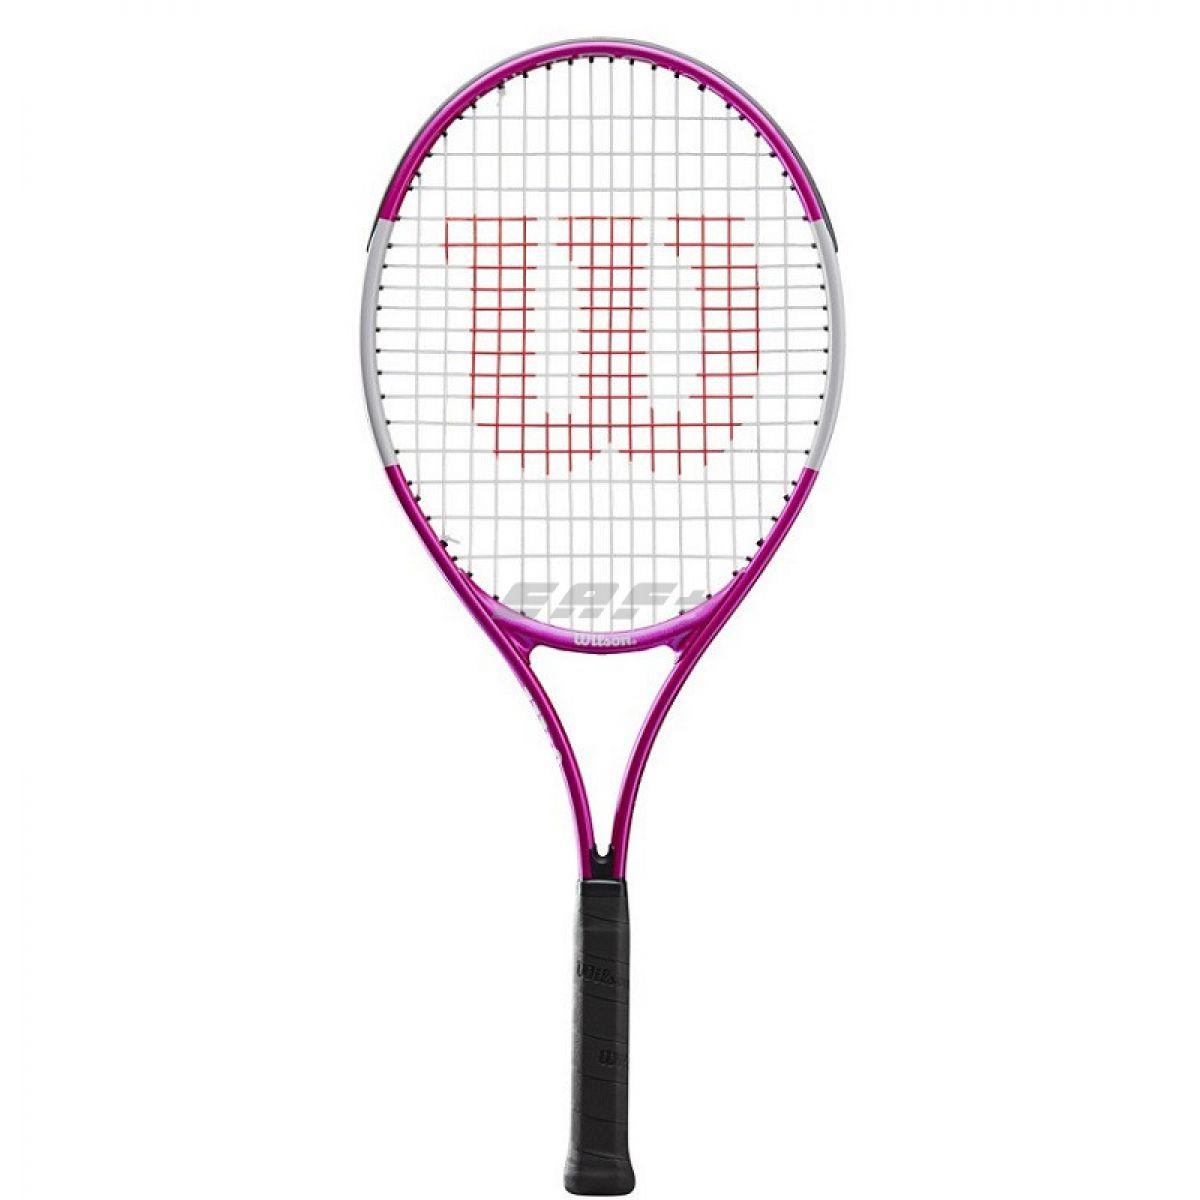 Ракетка теннисная Ракетка б/т Wilson Ultra Pink21 GR00000, арт.WR028010U,для 5-6 лет,алюминий,со струнами,роз-бел-черн